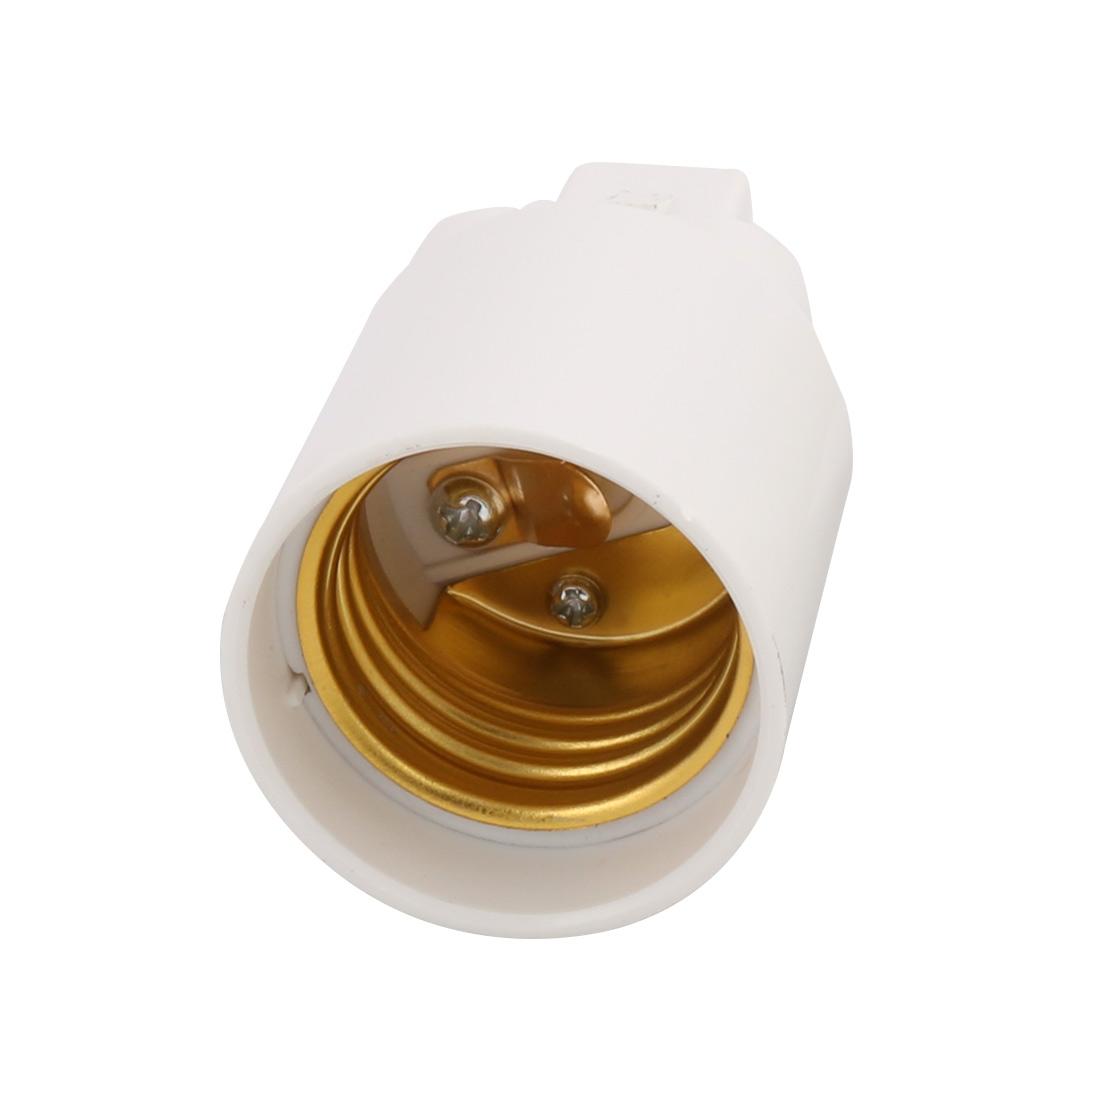 Unique BargainsG24 to E27 Light Socket, Bulb Base Adapter Converter, Commutator 10Pcs - image 1 of 4